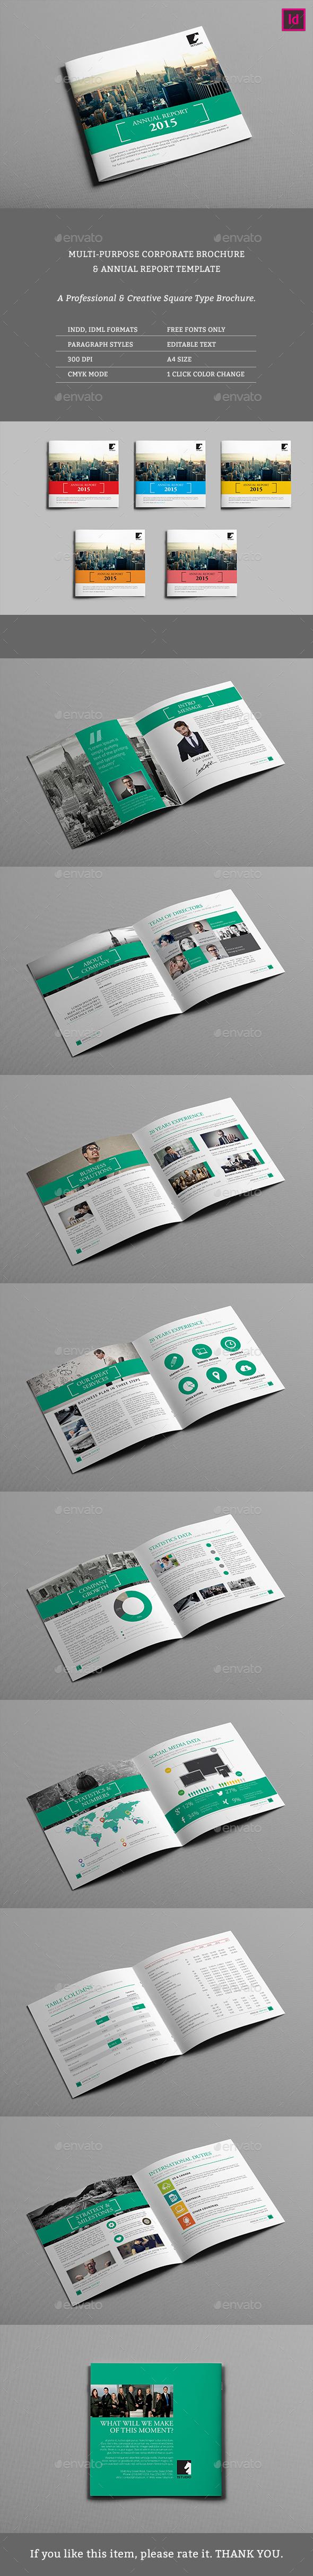 Square Corporate Brochure 01 - Corporate Brochures